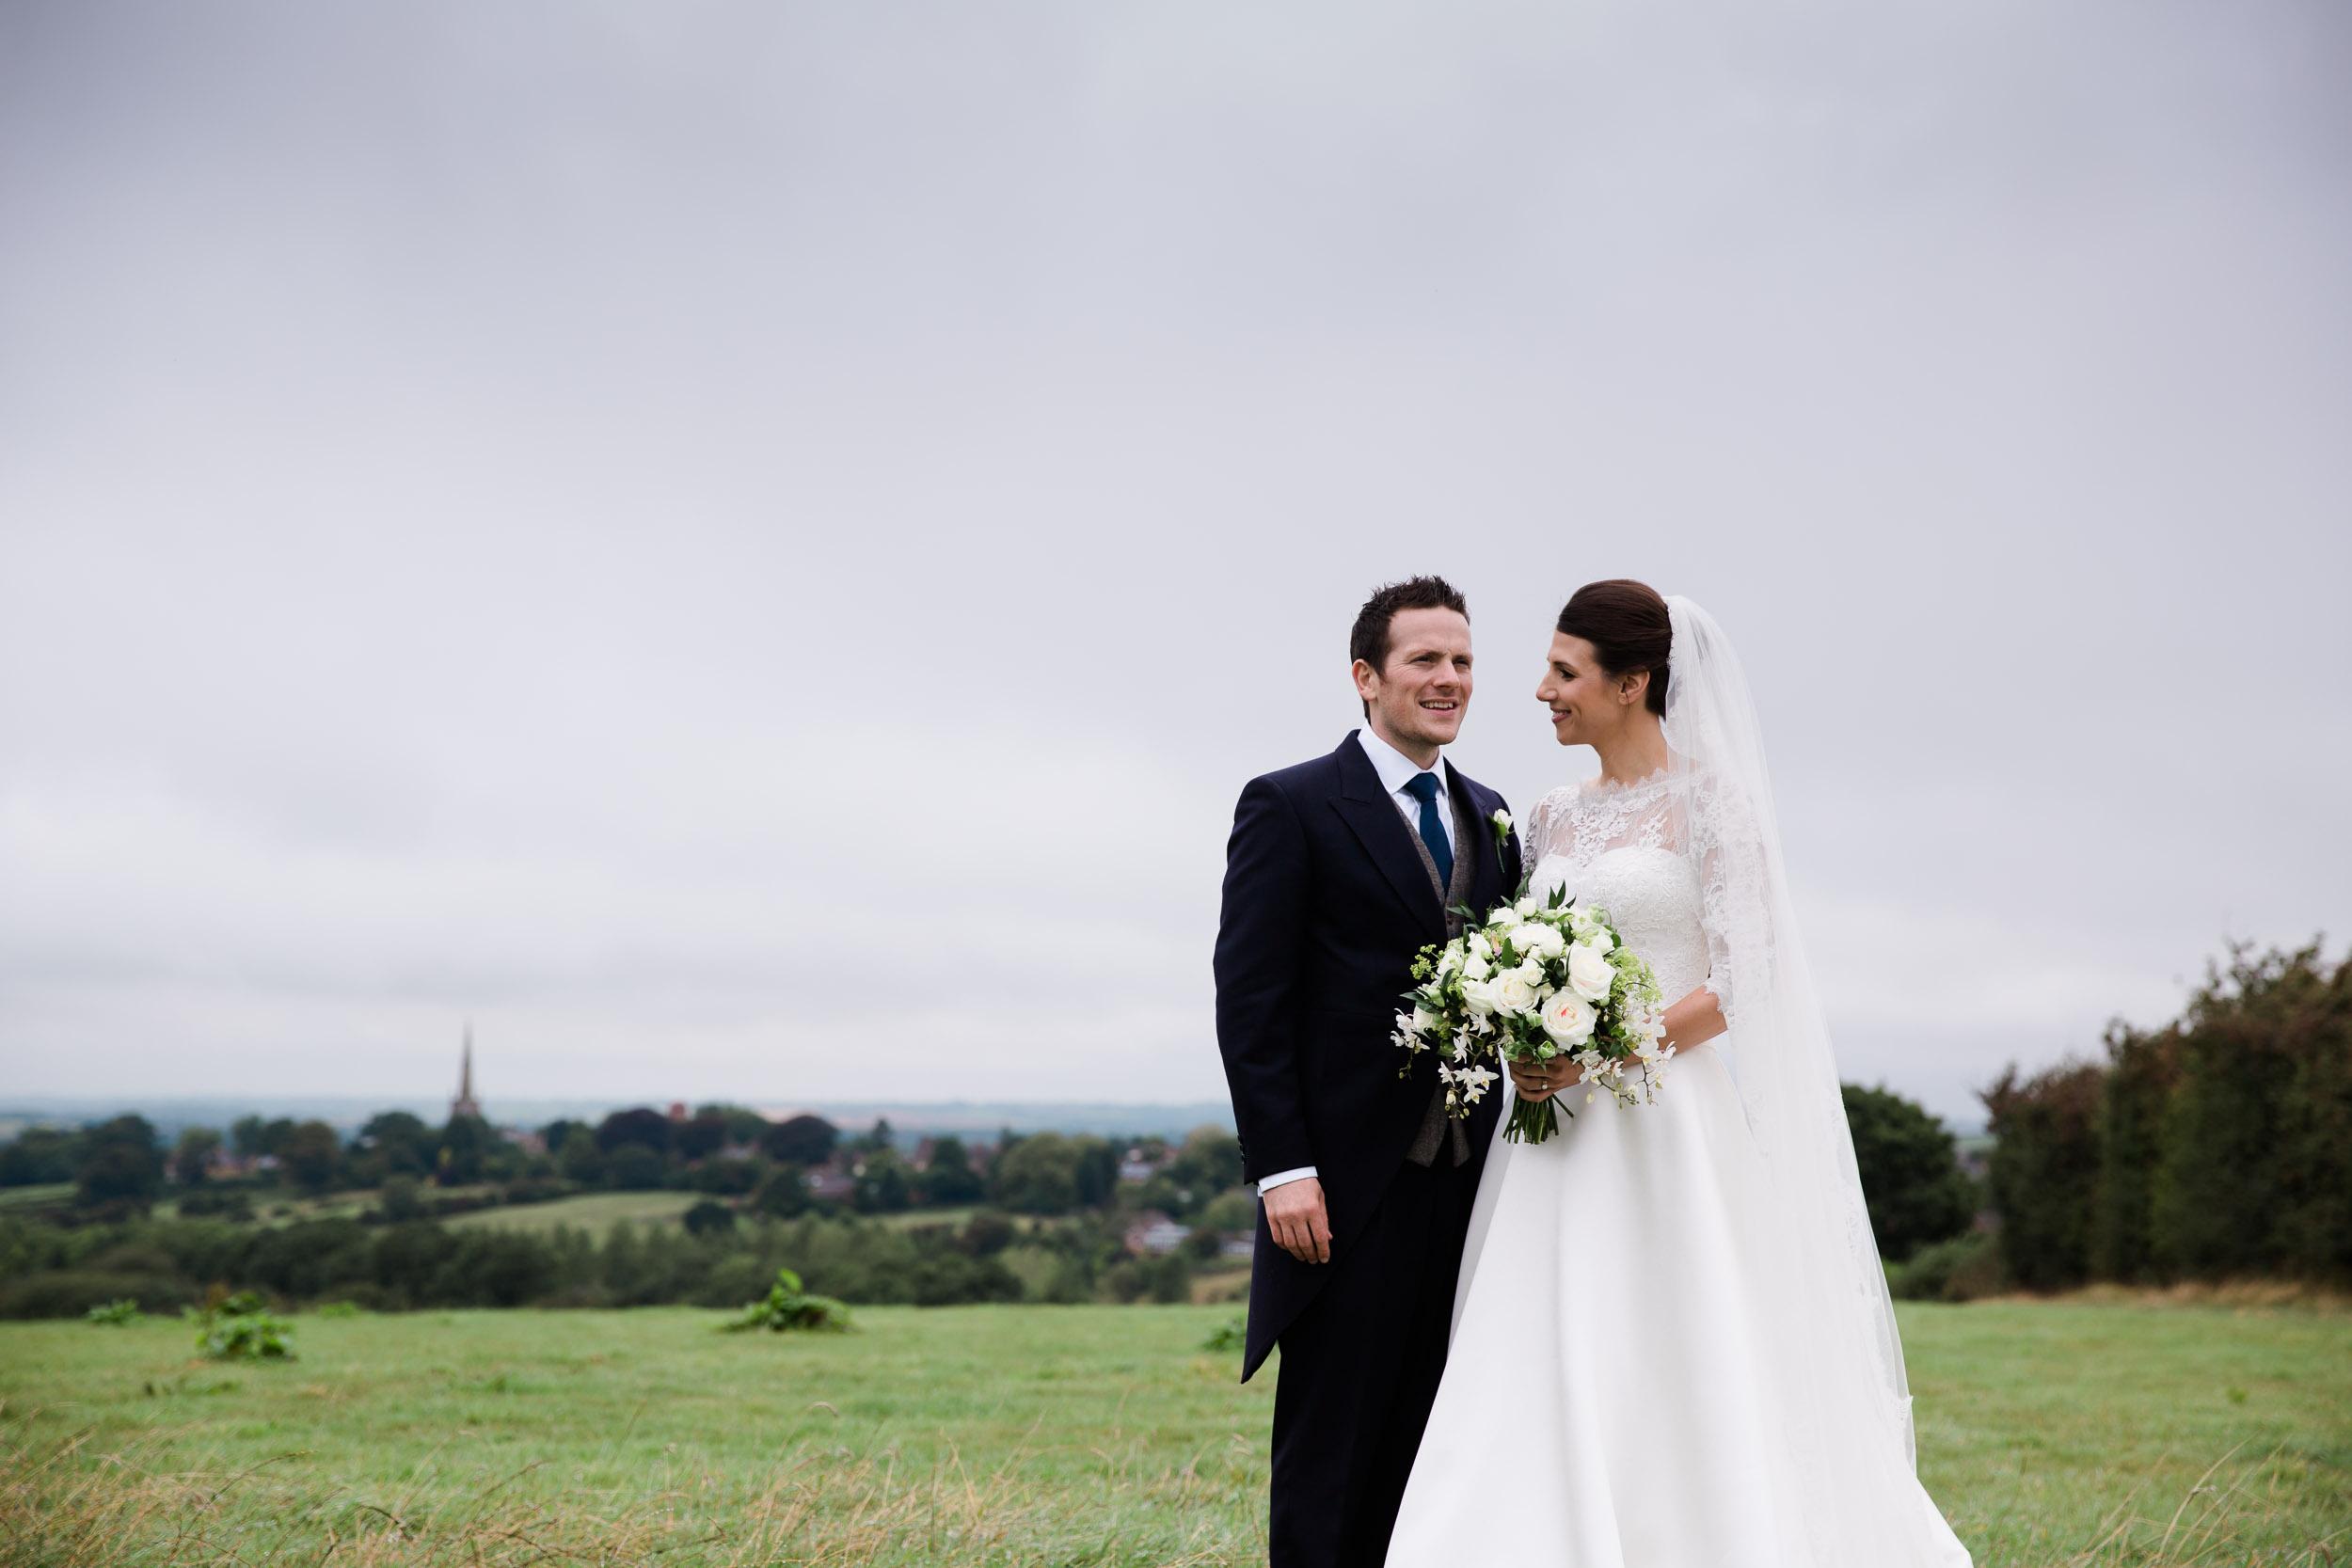 chic-rustic-home-farm-wedding-125